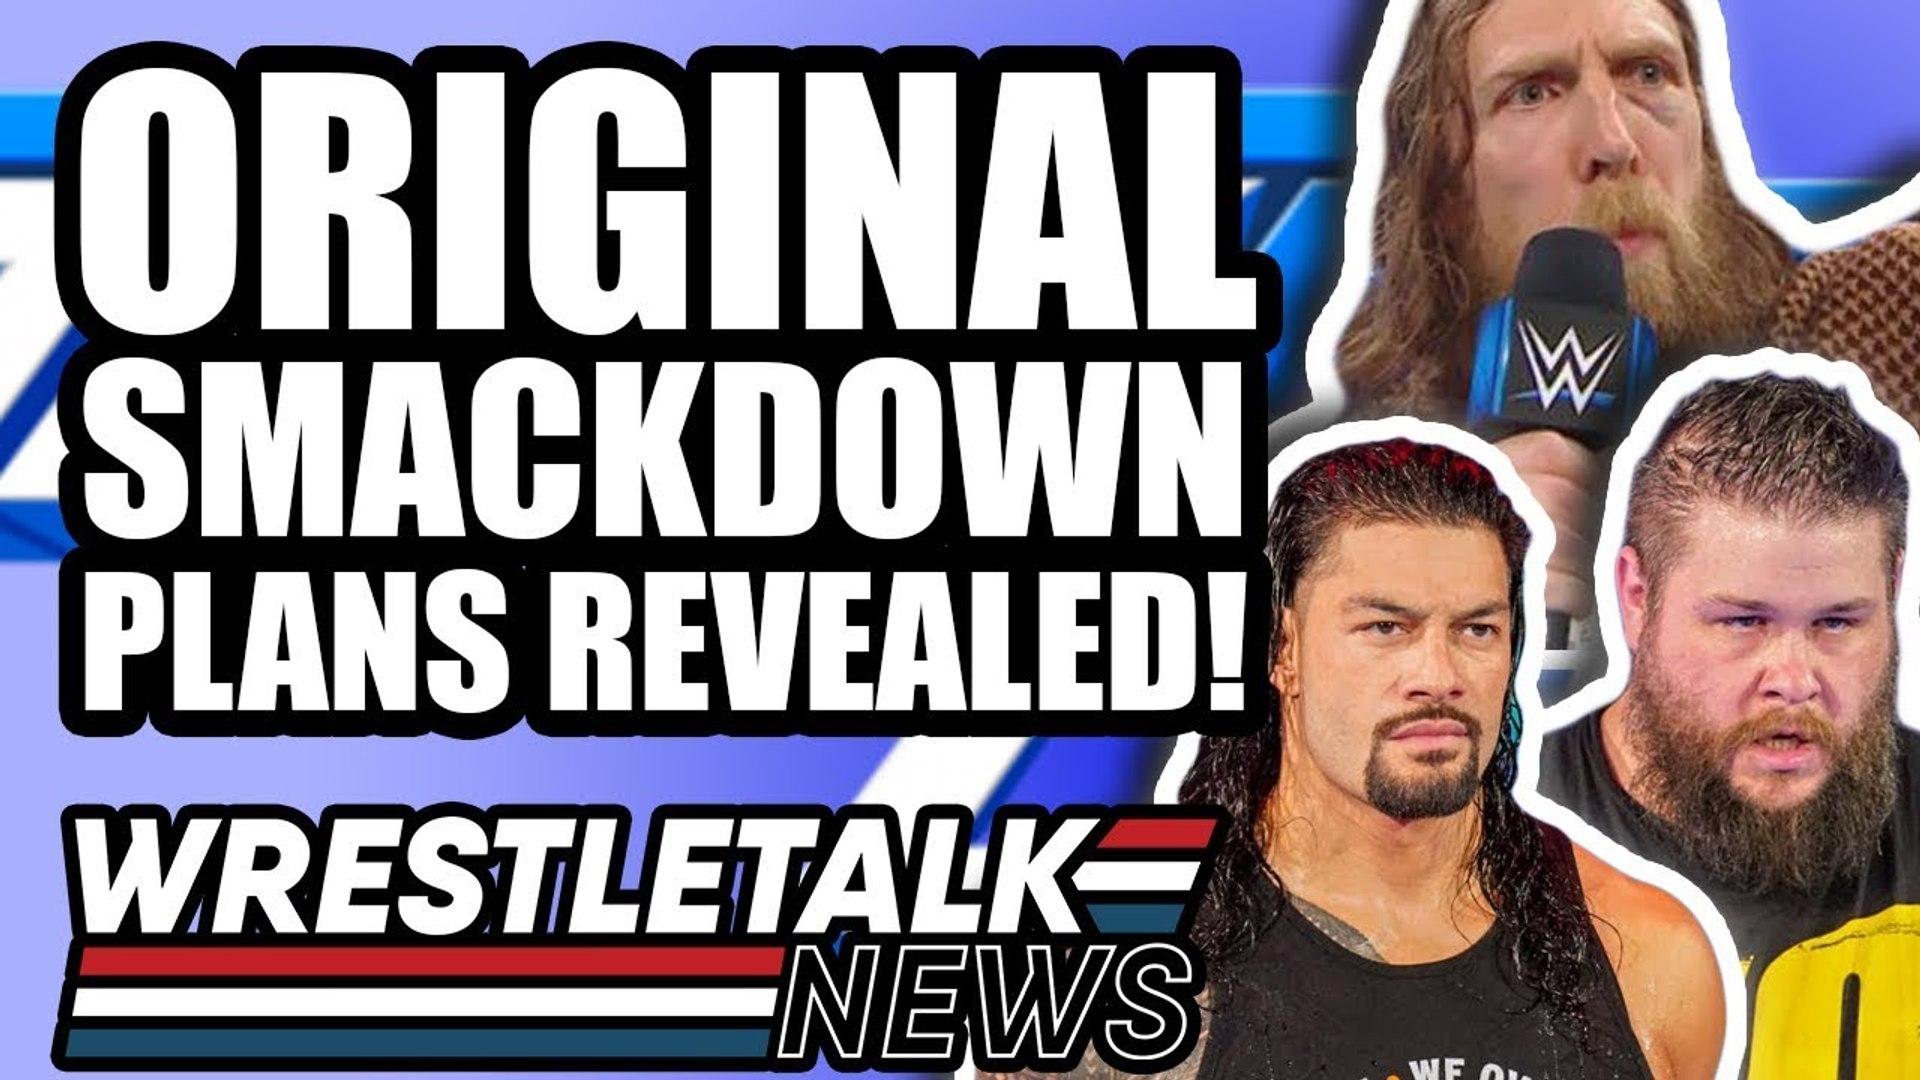 WWE Backstage HEAT On Star! Original WWE Smackdown Live Plans REVEALED! | WrestleTalk News Apr. 2019